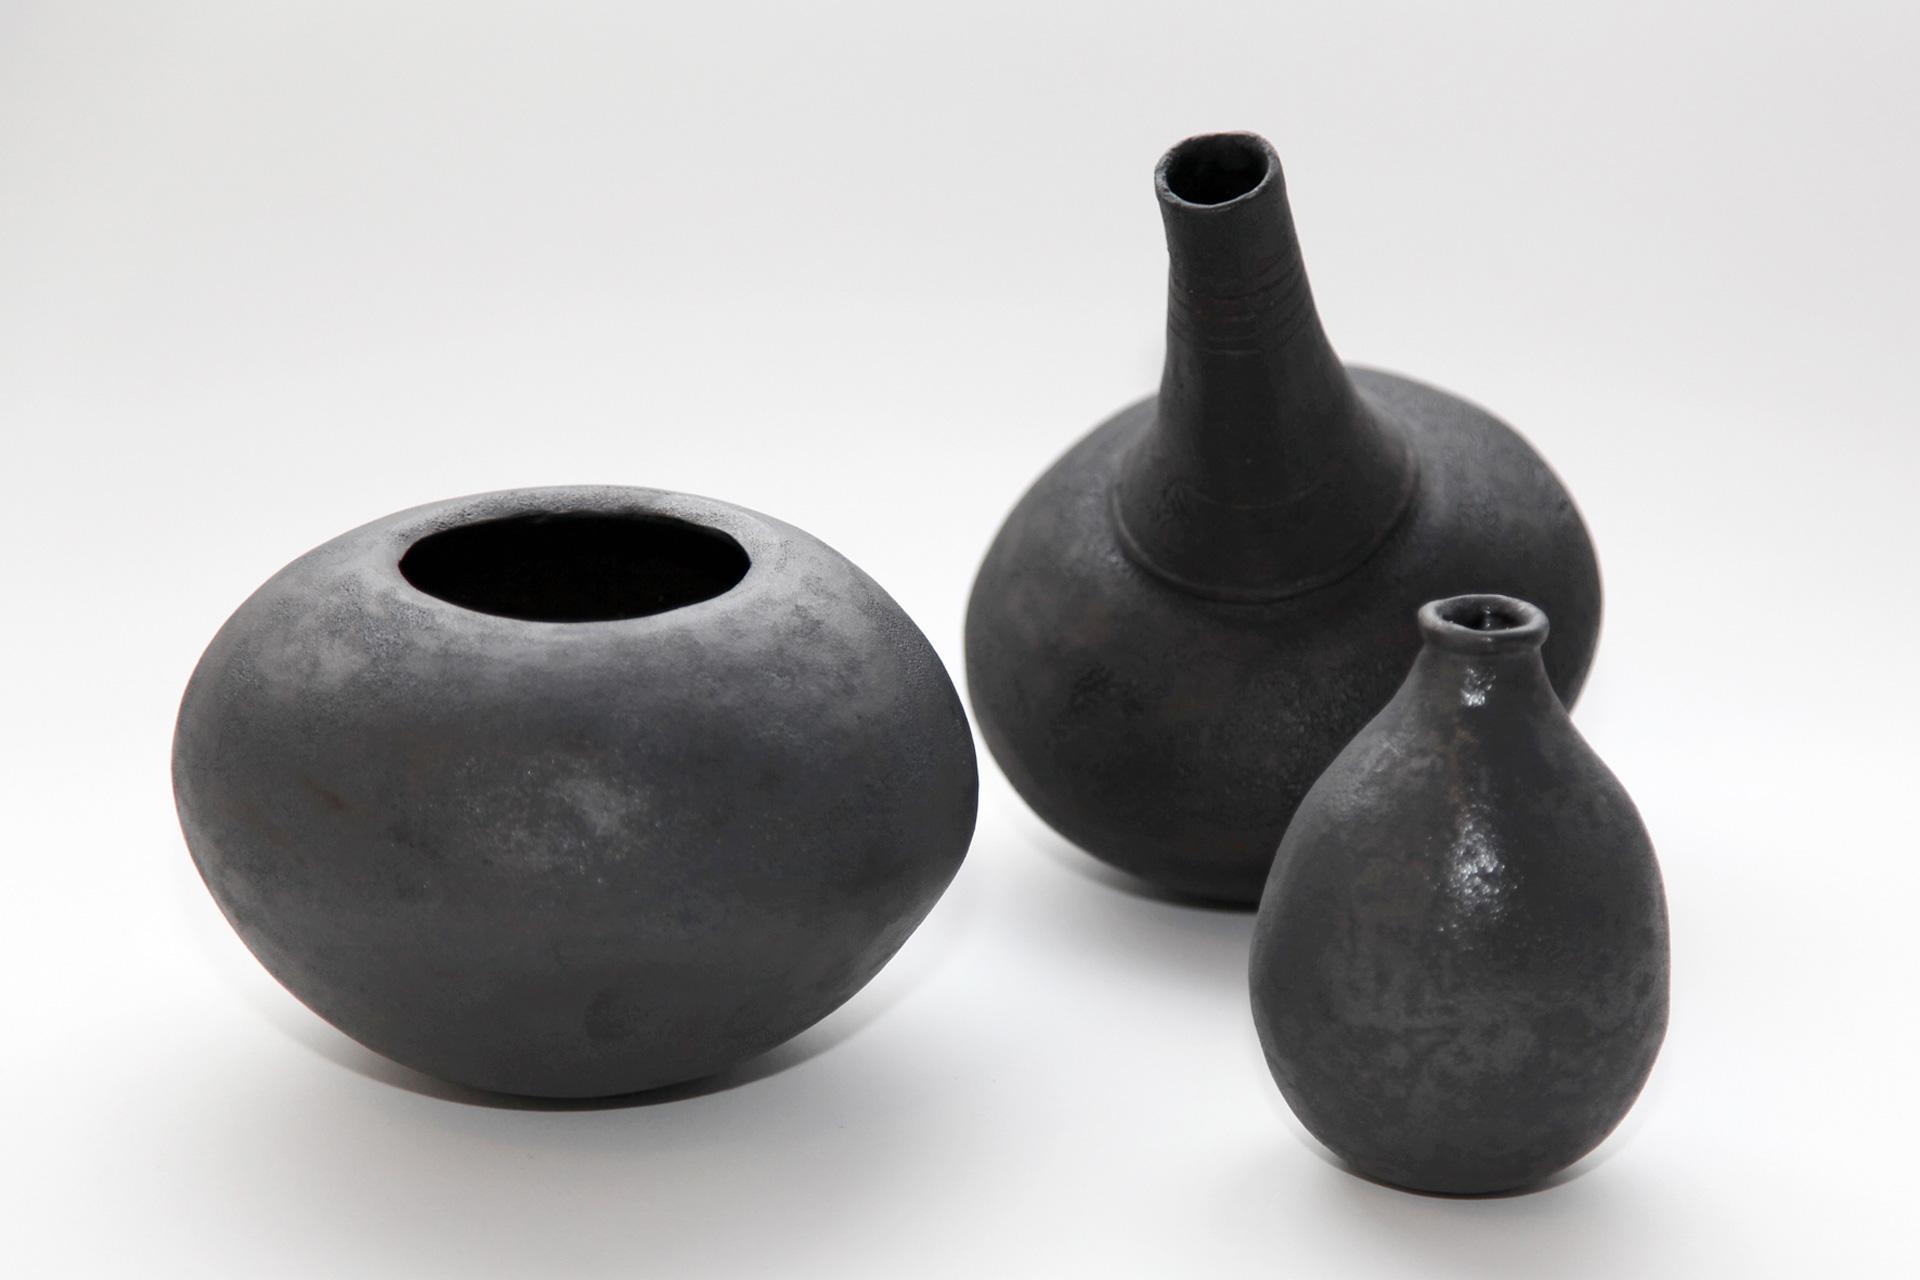 schwarze vase 3 ladengalerie sphinx. Black Bedroom Furniture Sets. Home Design Ideas